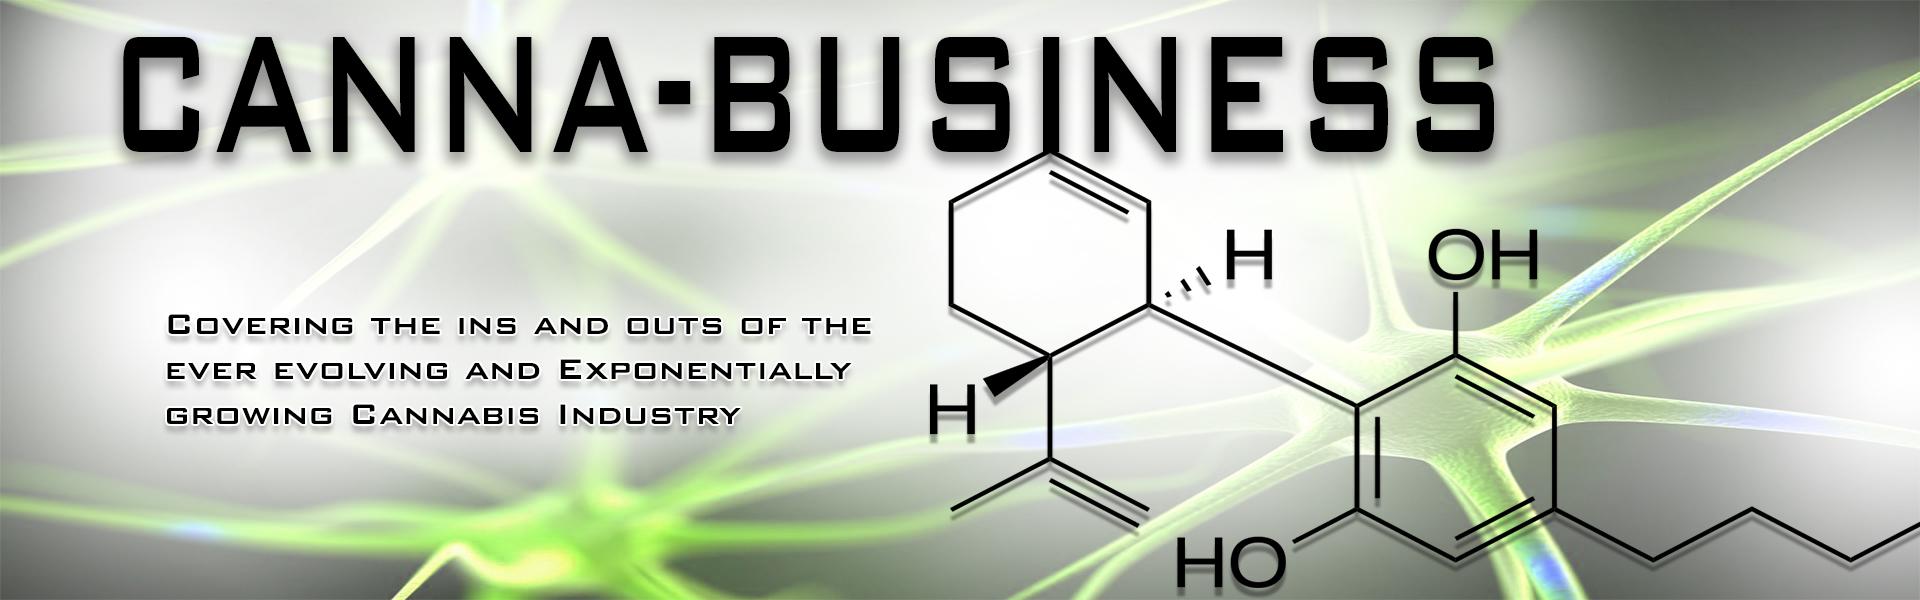 Canna-Business